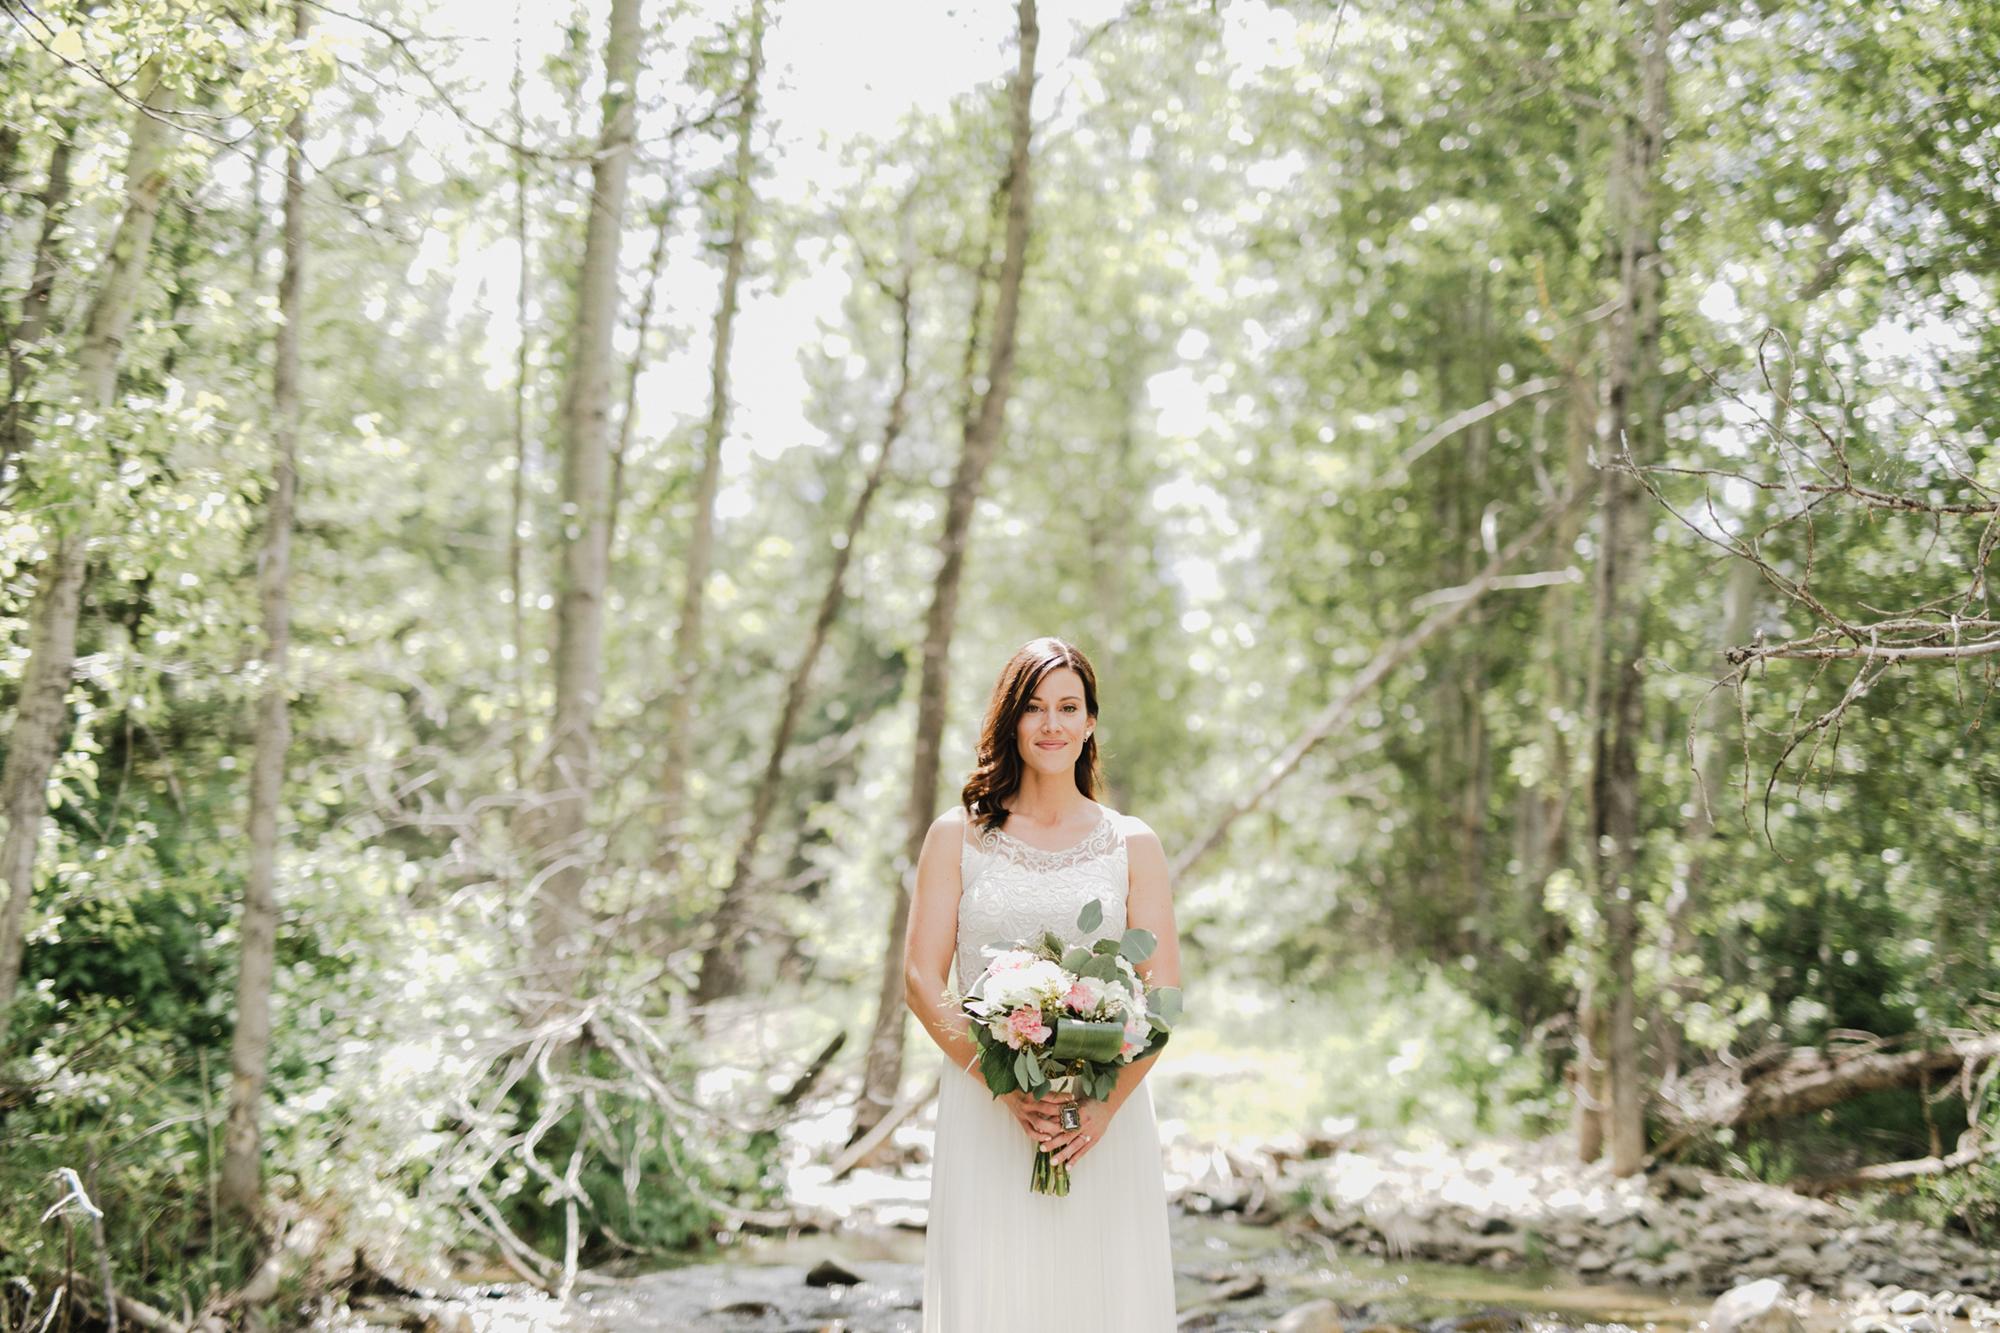 Flower Farm Crowsnest Pass Wedding -045.JPG